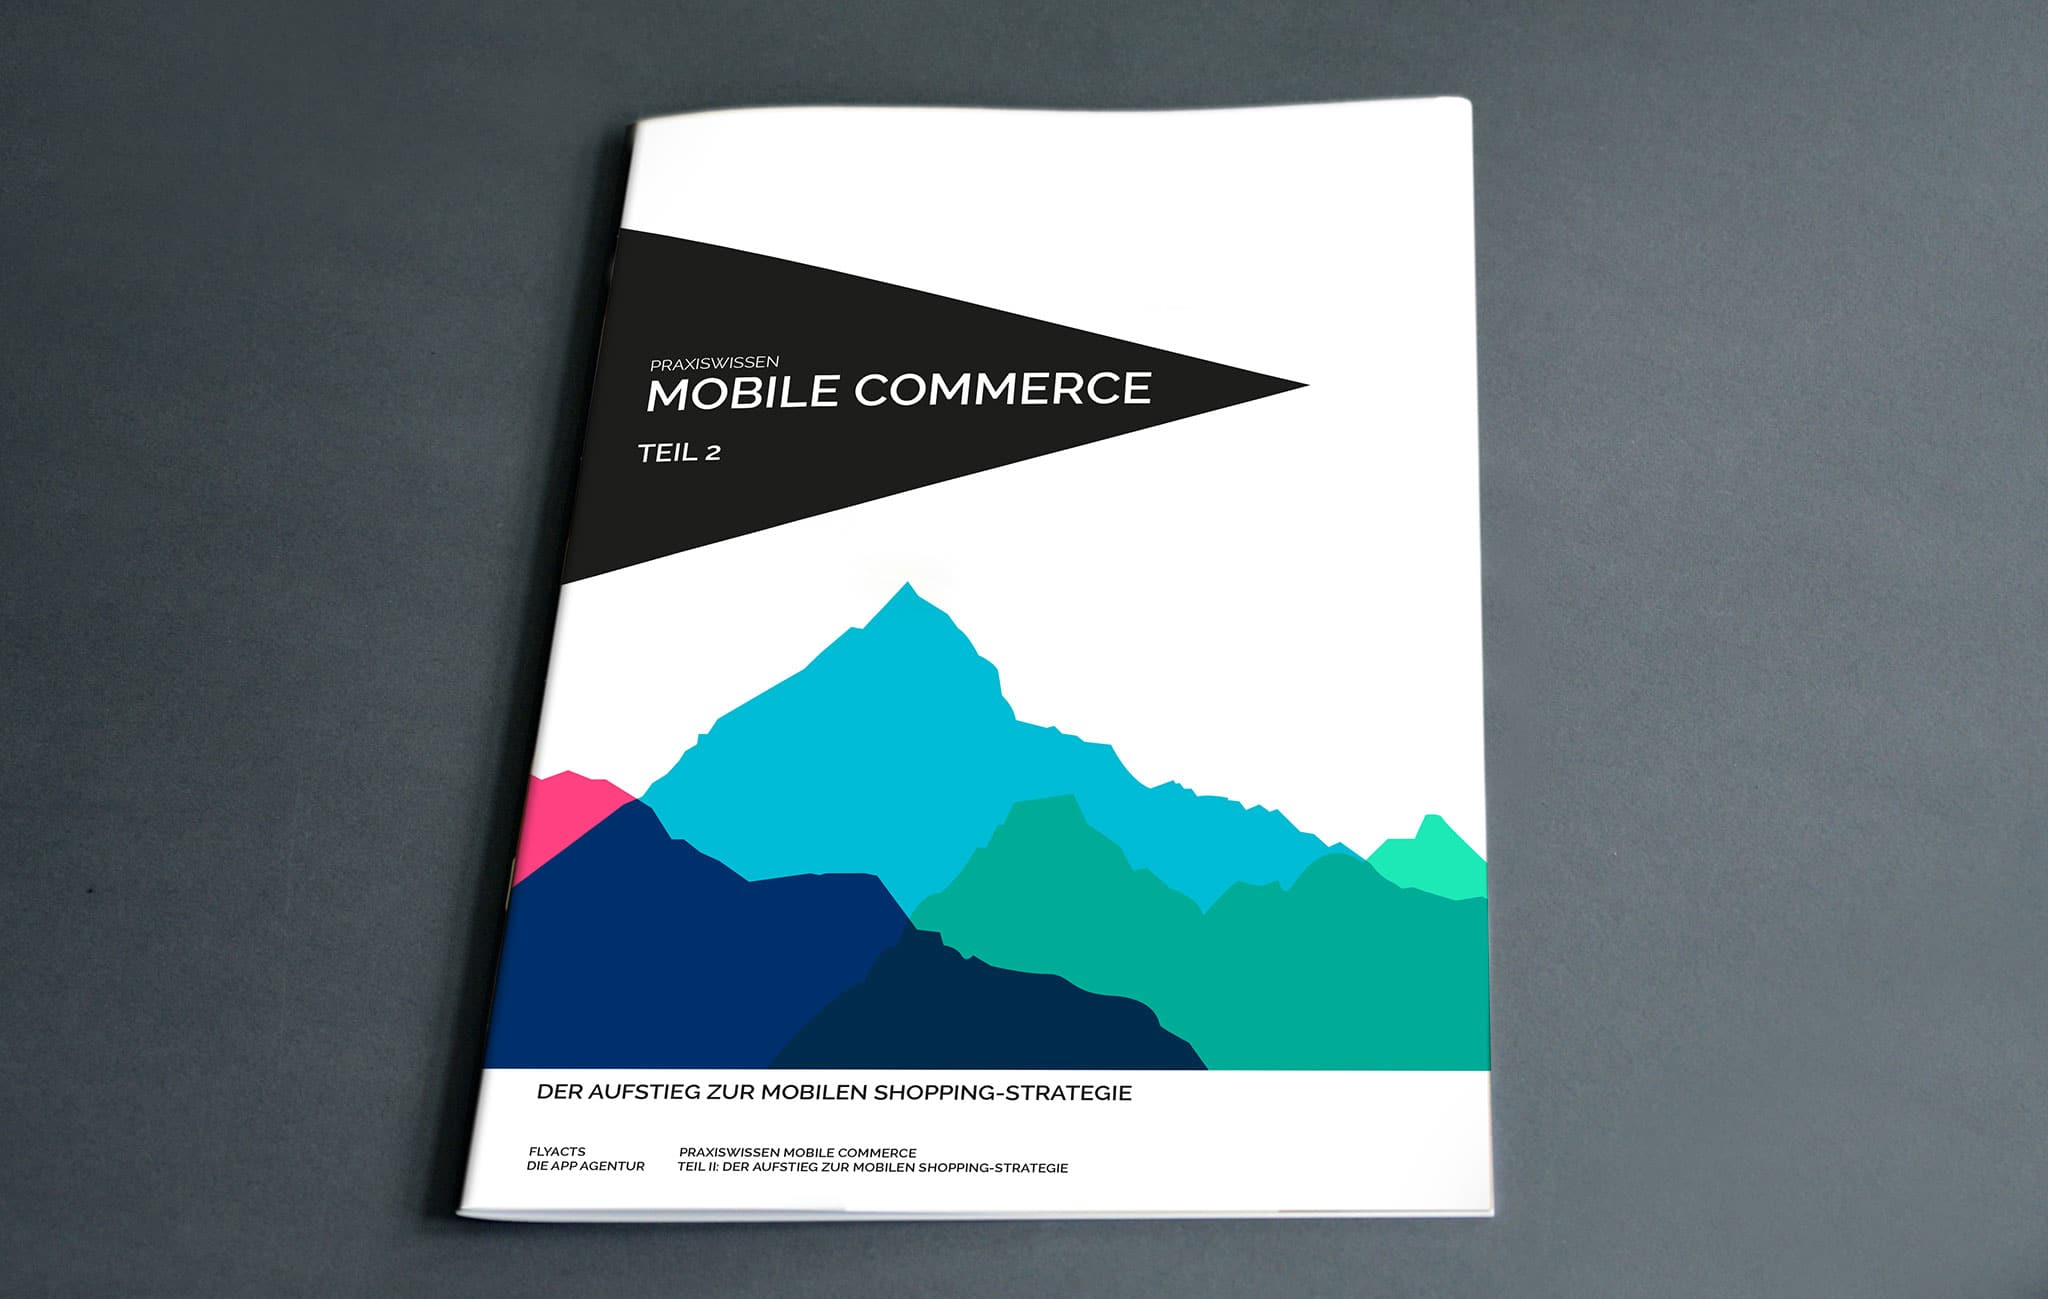 Praxiswissen Mobile Commerce Teil 2